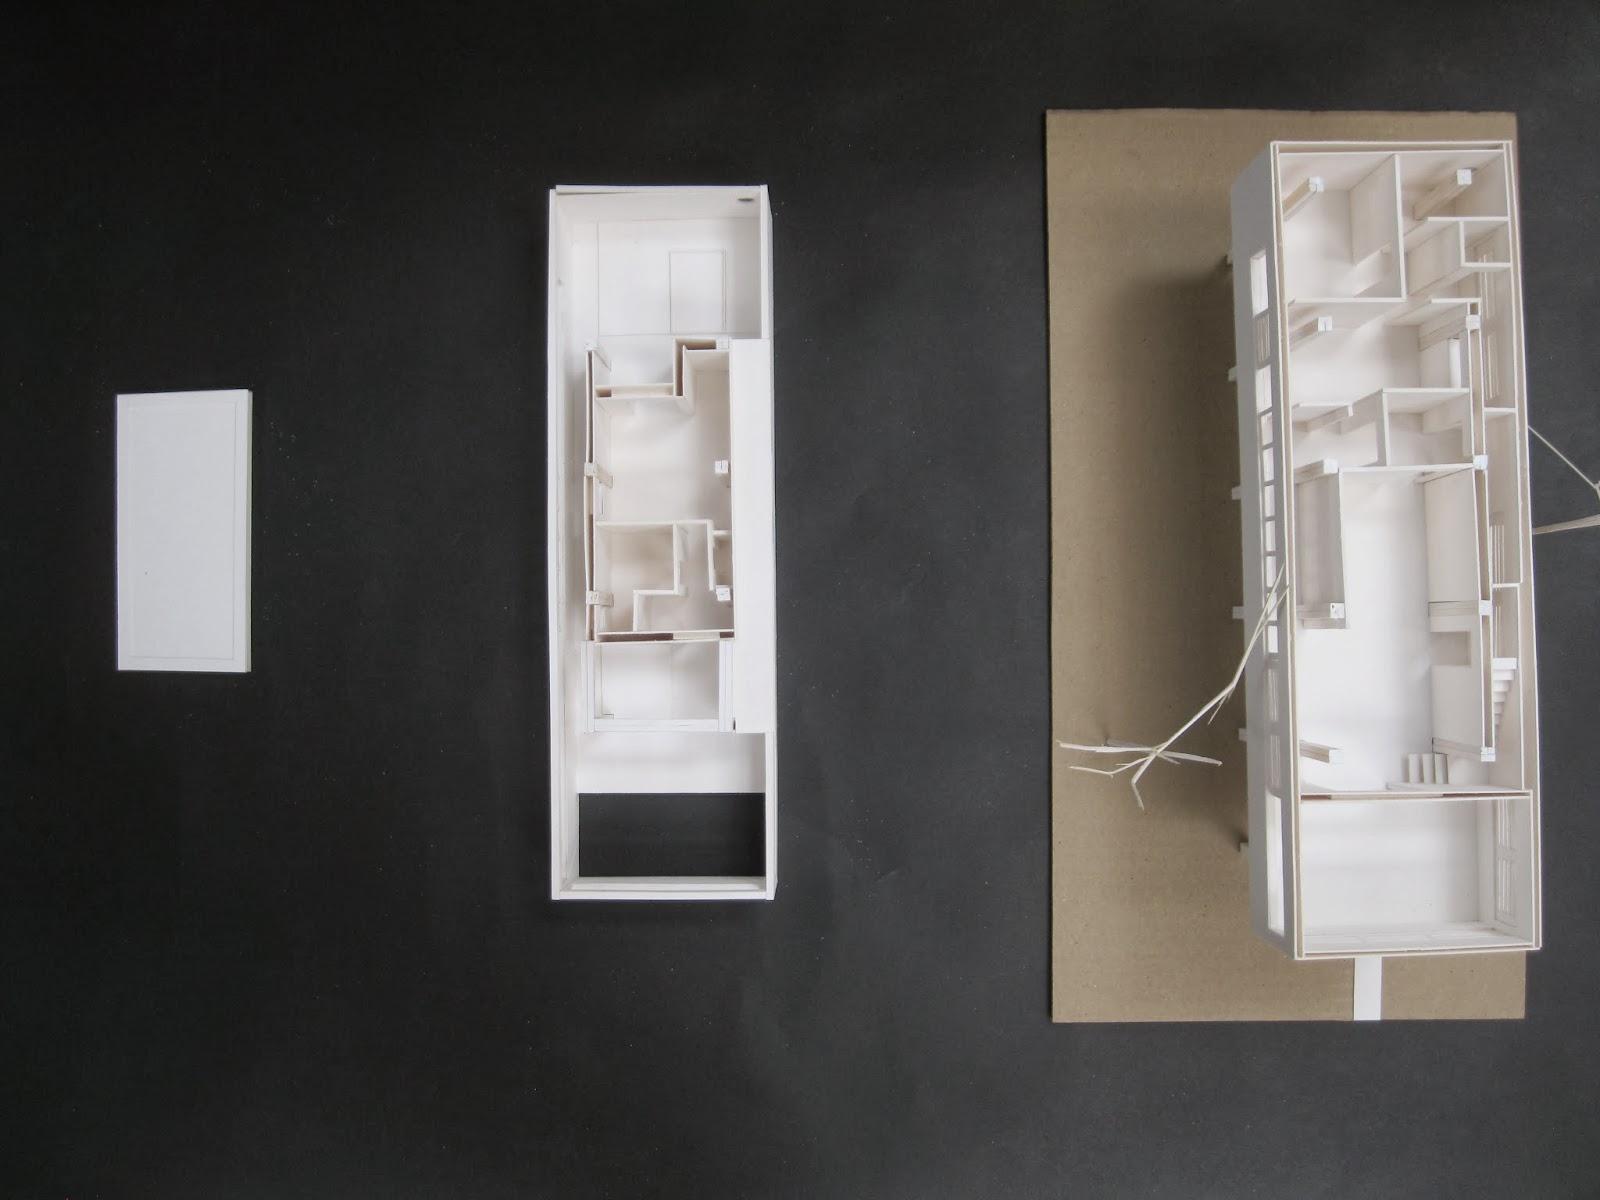 Historia de la arquitectura moderna villa figini luigi for Historia de la arquitectura moderna